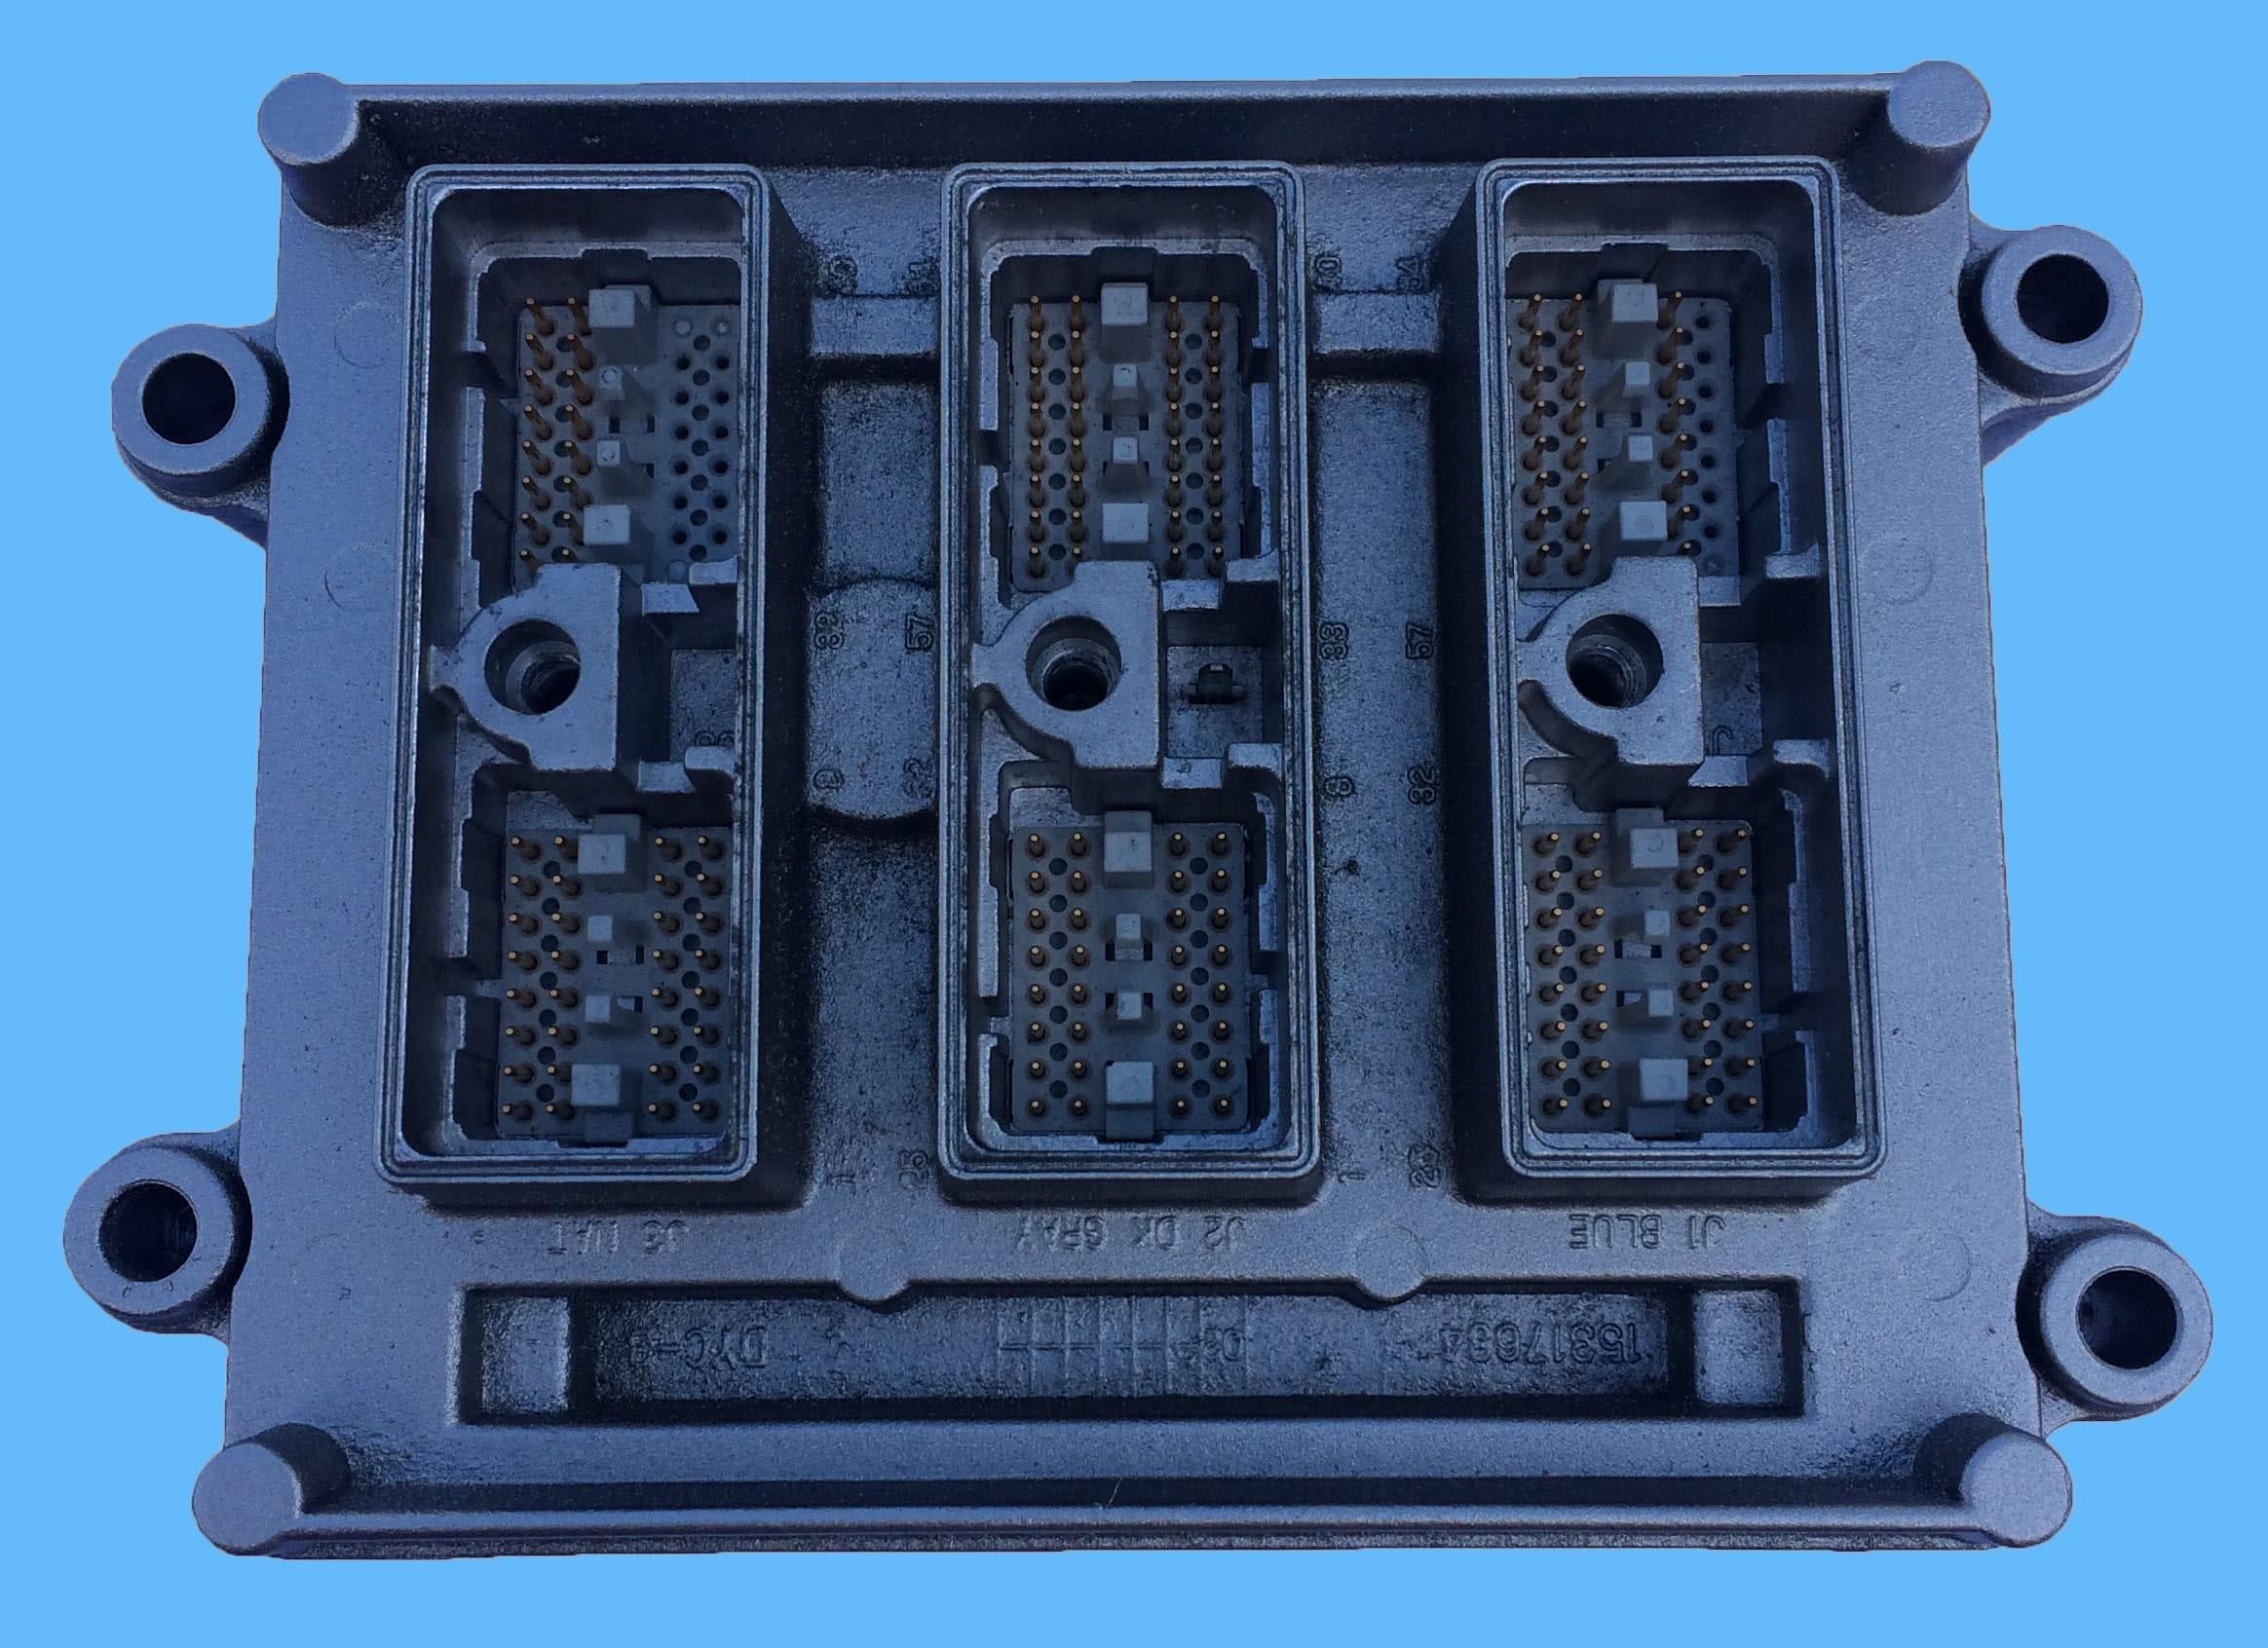 2005 Chevrolet Trailblazer EXT 4.2L V6 Gas Engine Control Module ECM / ECU - Engine Control Module